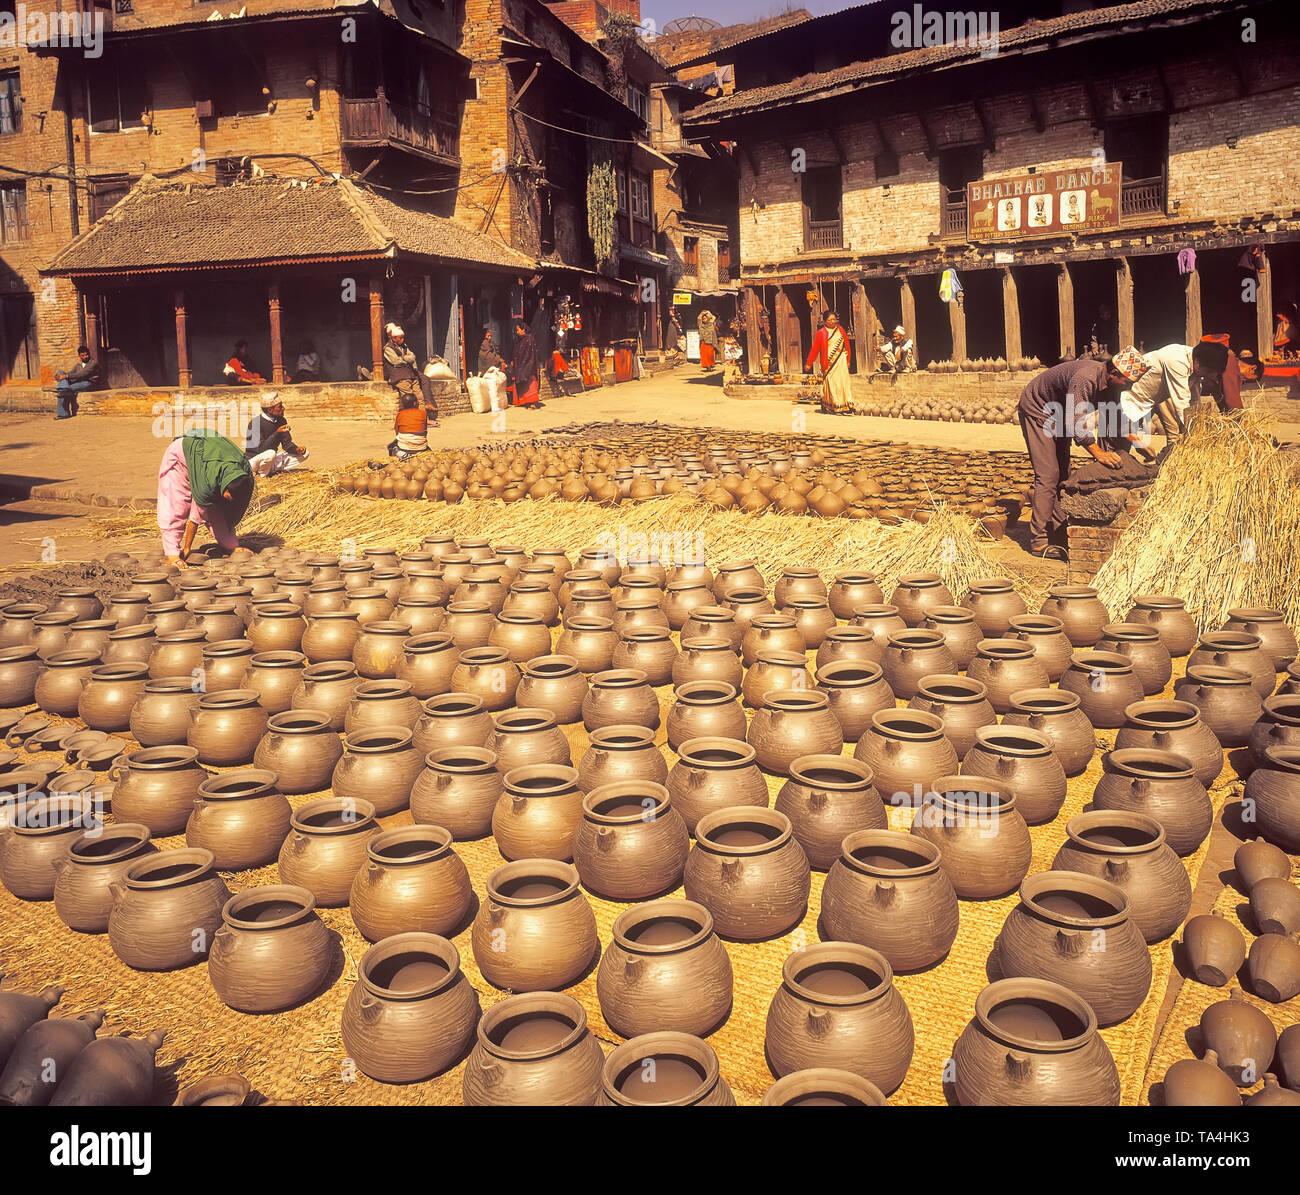 Pottery, Potterry Square, Bhaktapur, Nepal, Asia - Stock Image